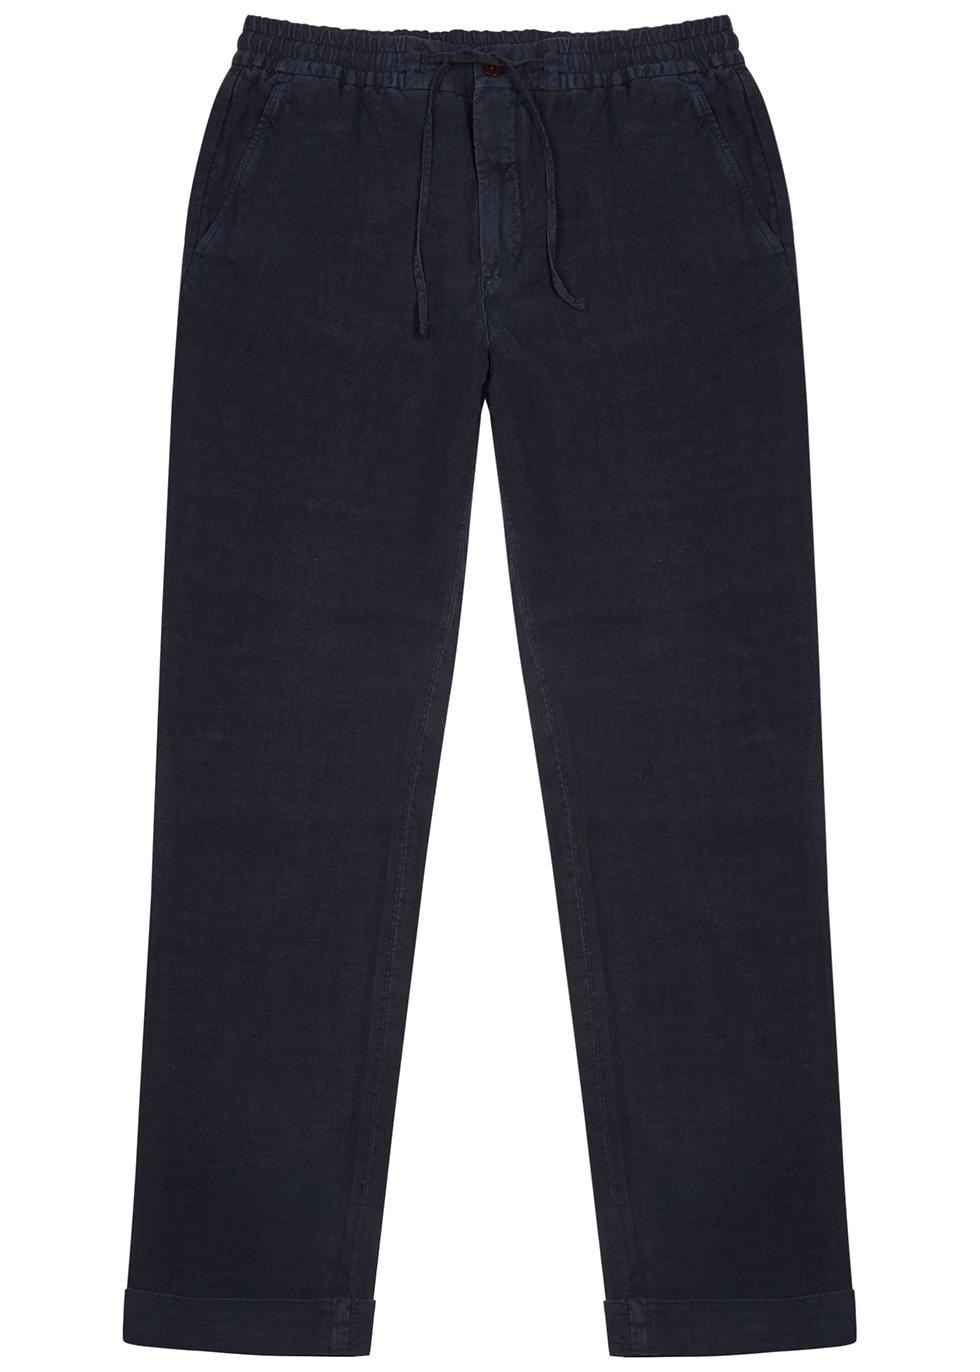 Seb navy linen trousers